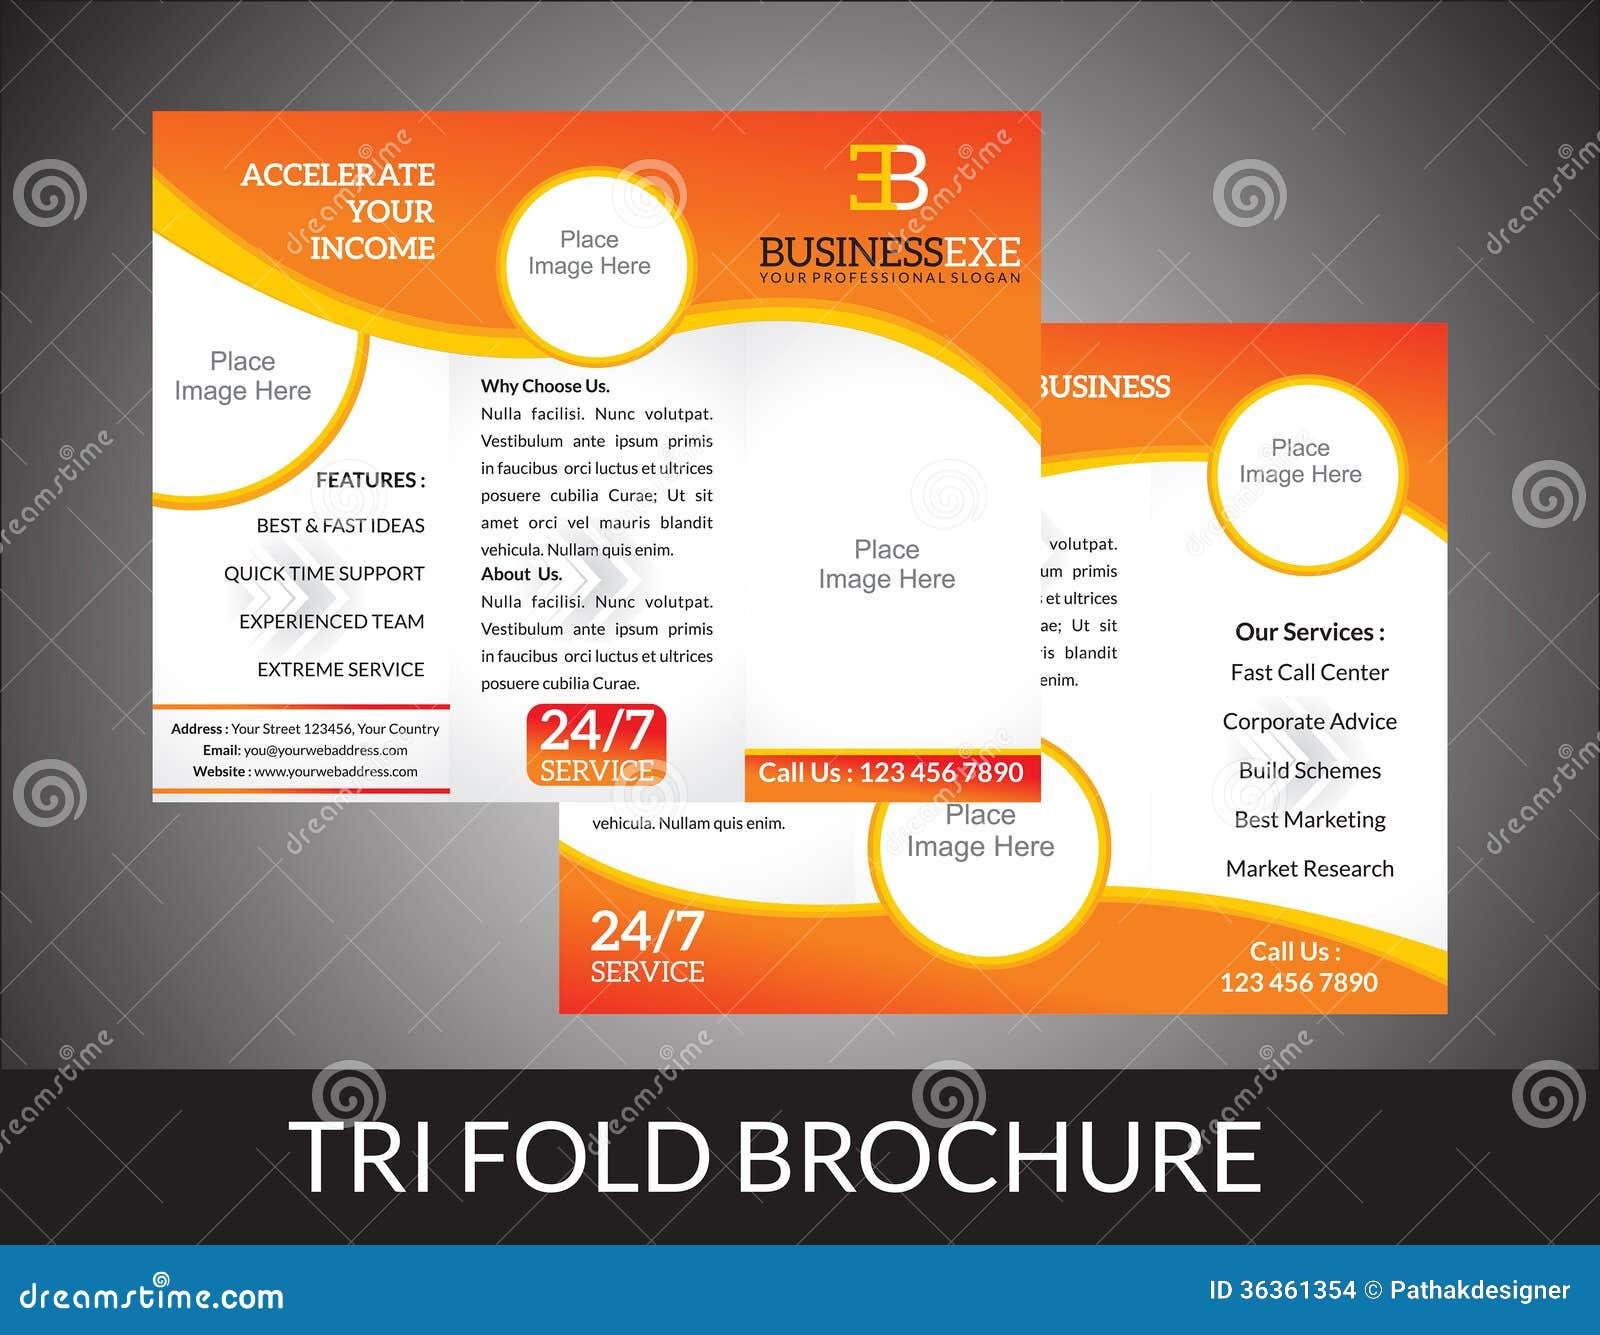 Tri-Fold Jewelry Store Brochure Stock Vector - Image: 41889030